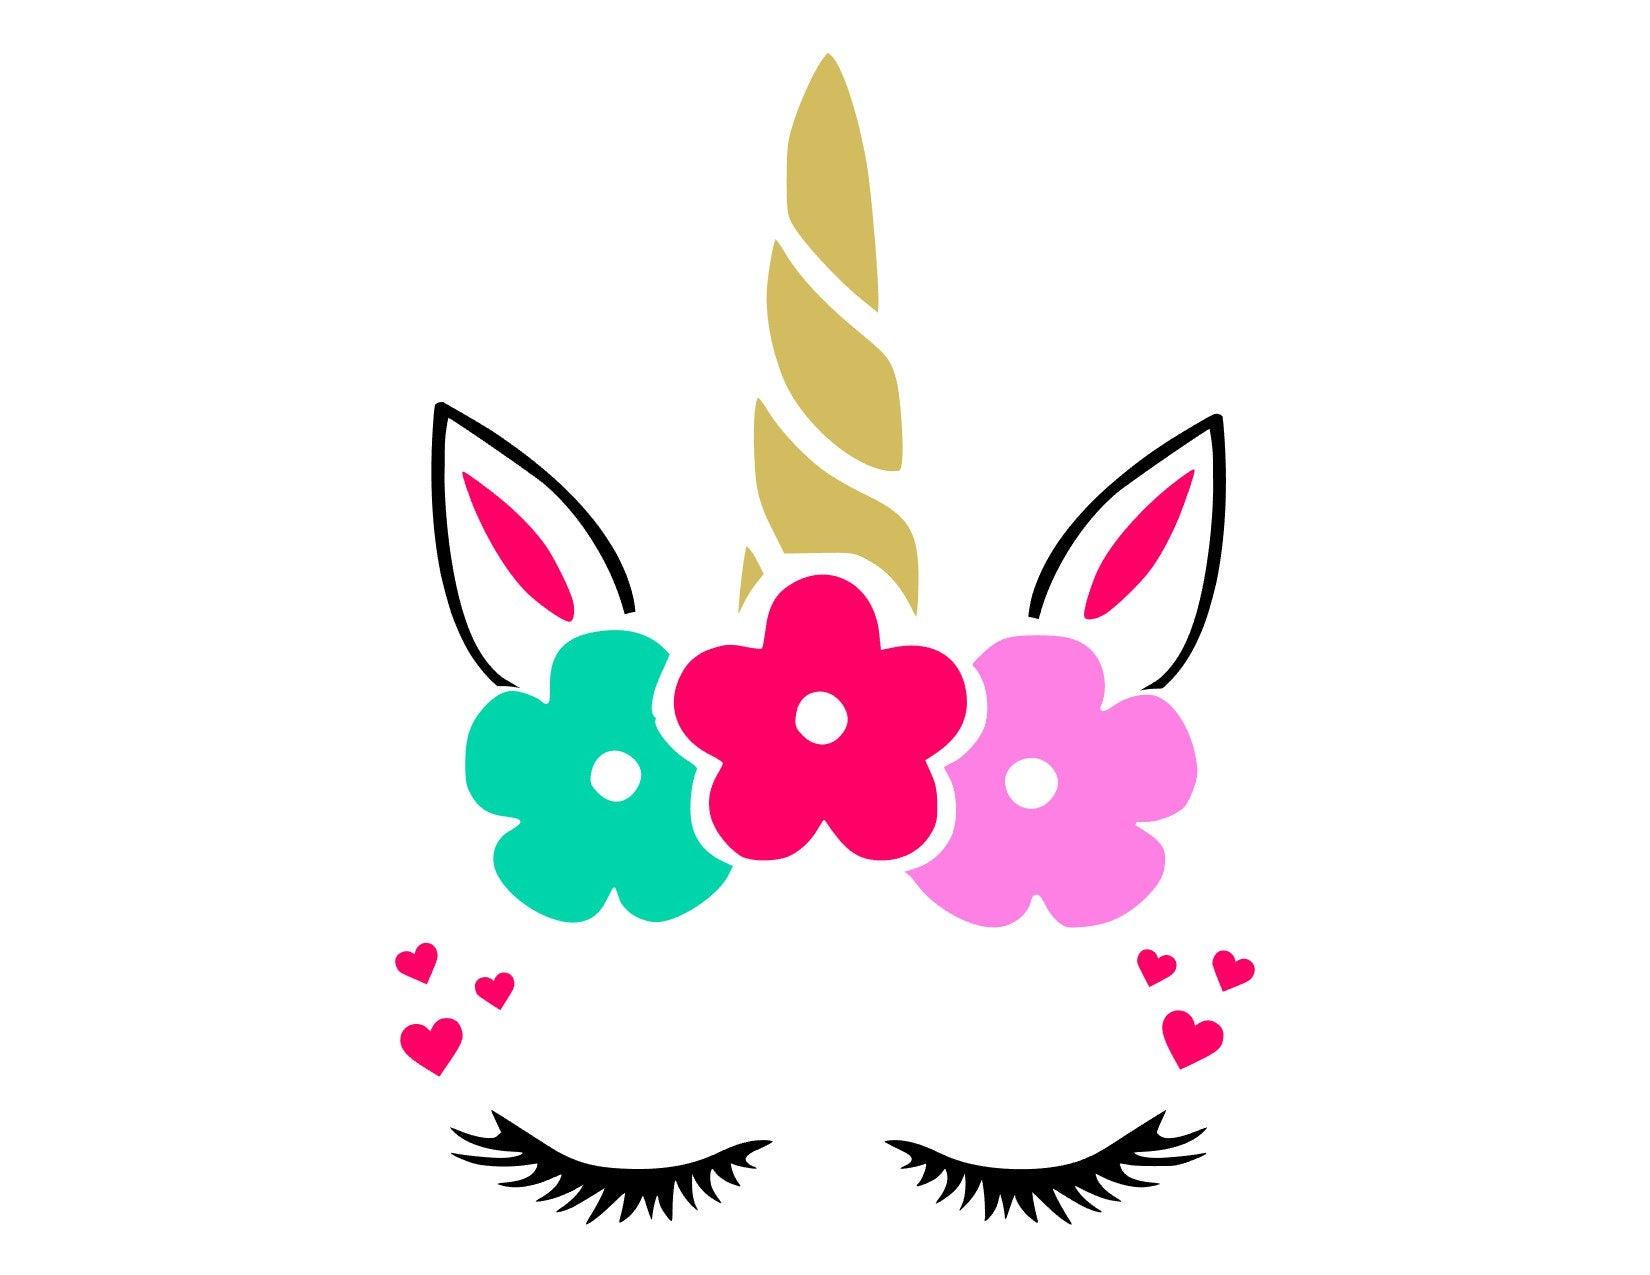 unicorn face svg  unicorn face cut files svg  studio Halloween Free Downloads for Cricut Free Downloads for Cricut Cupcake